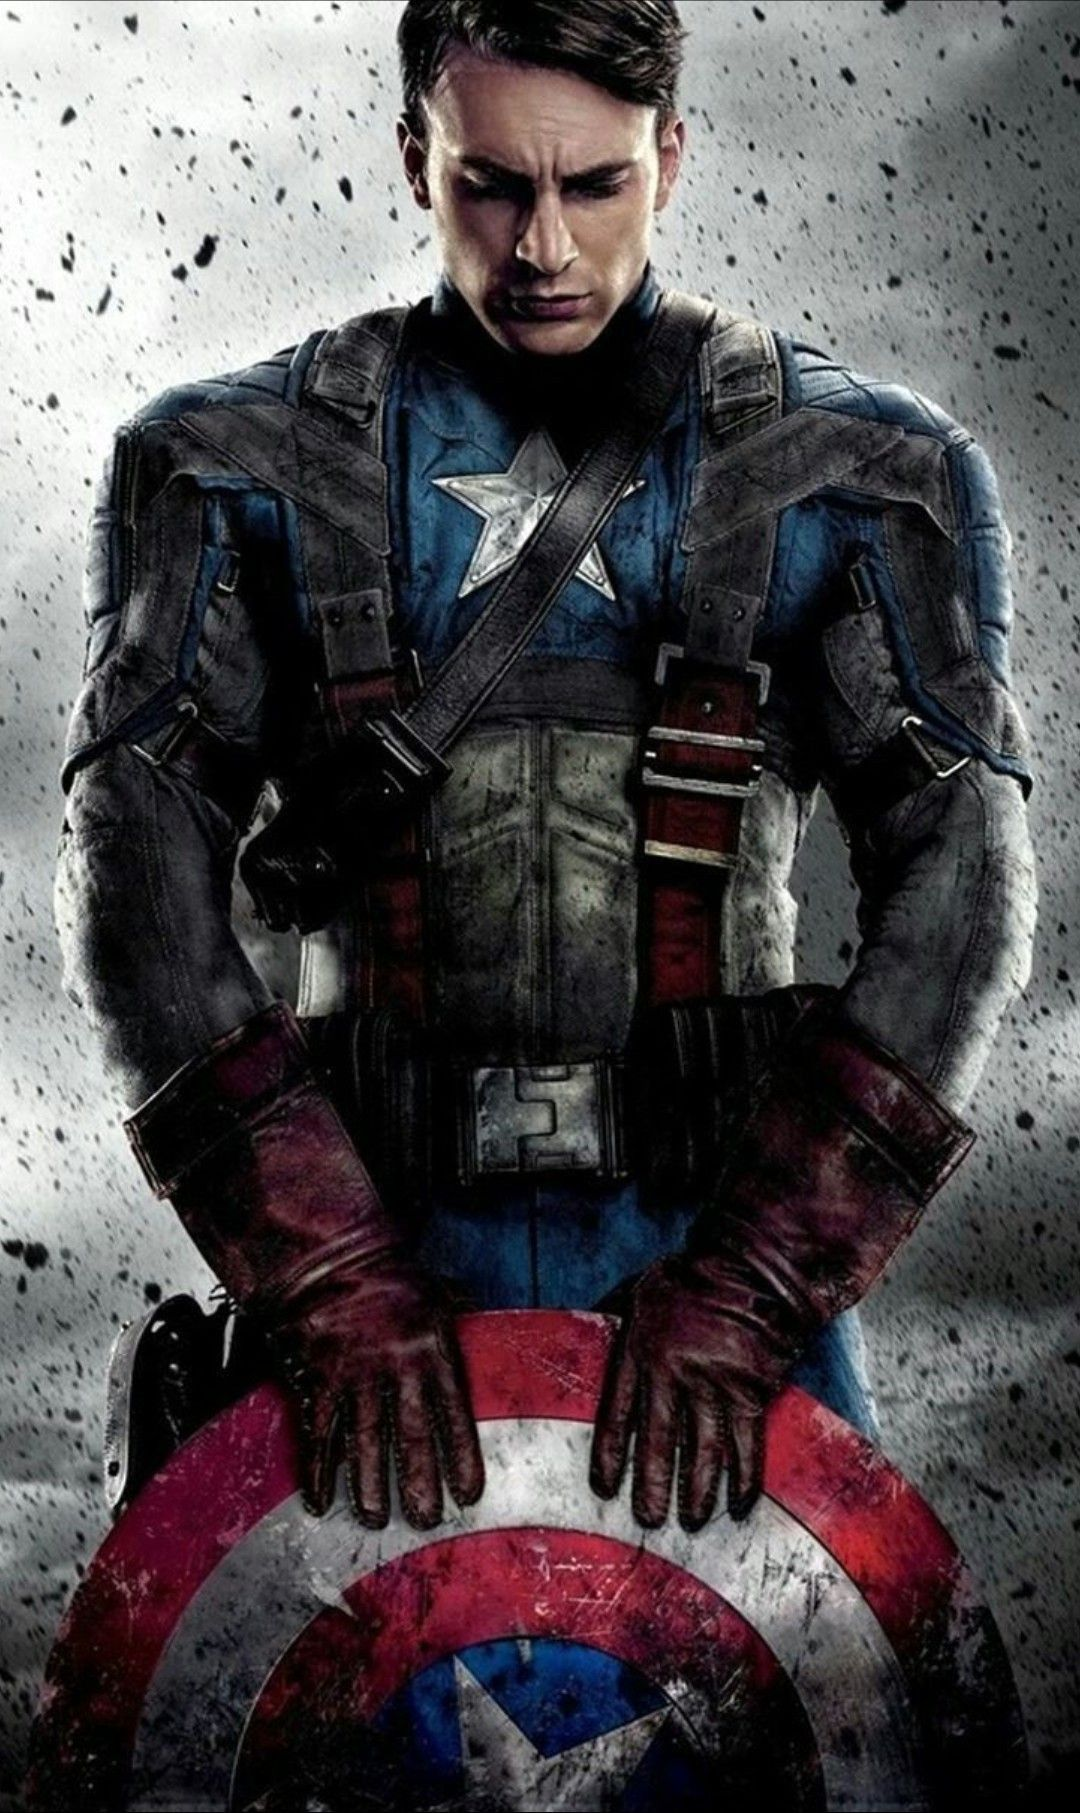 Captain Marvel Lockscreen Beautiful Captain America Lockscreen Of Captain Marvel Lockscreen C Captain America Wallpaper Avengers Movie Posters Avengers Movies